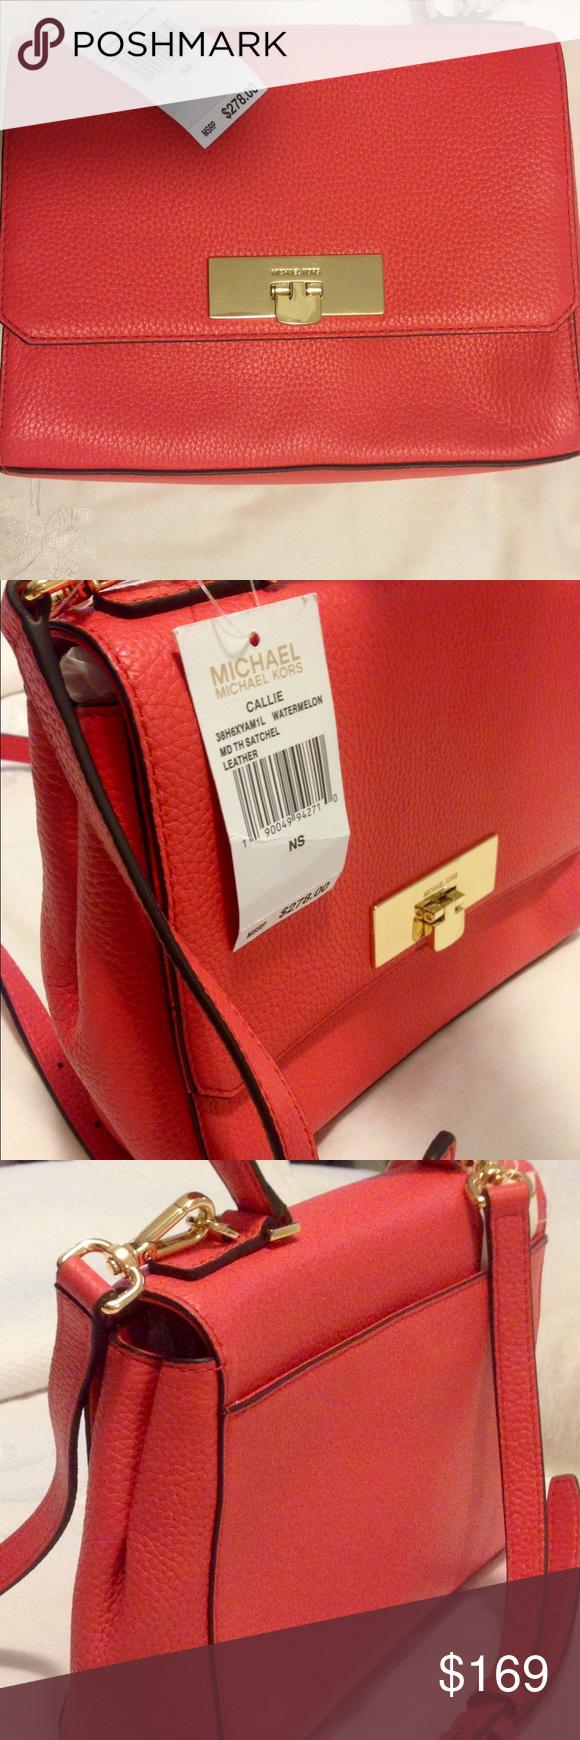 4638f664f20e Michael Kors Callie Med Leather Handbag Satchel NWT | My Posh Picks |  Pinterest | Leather handbags, Handbags and Satchel